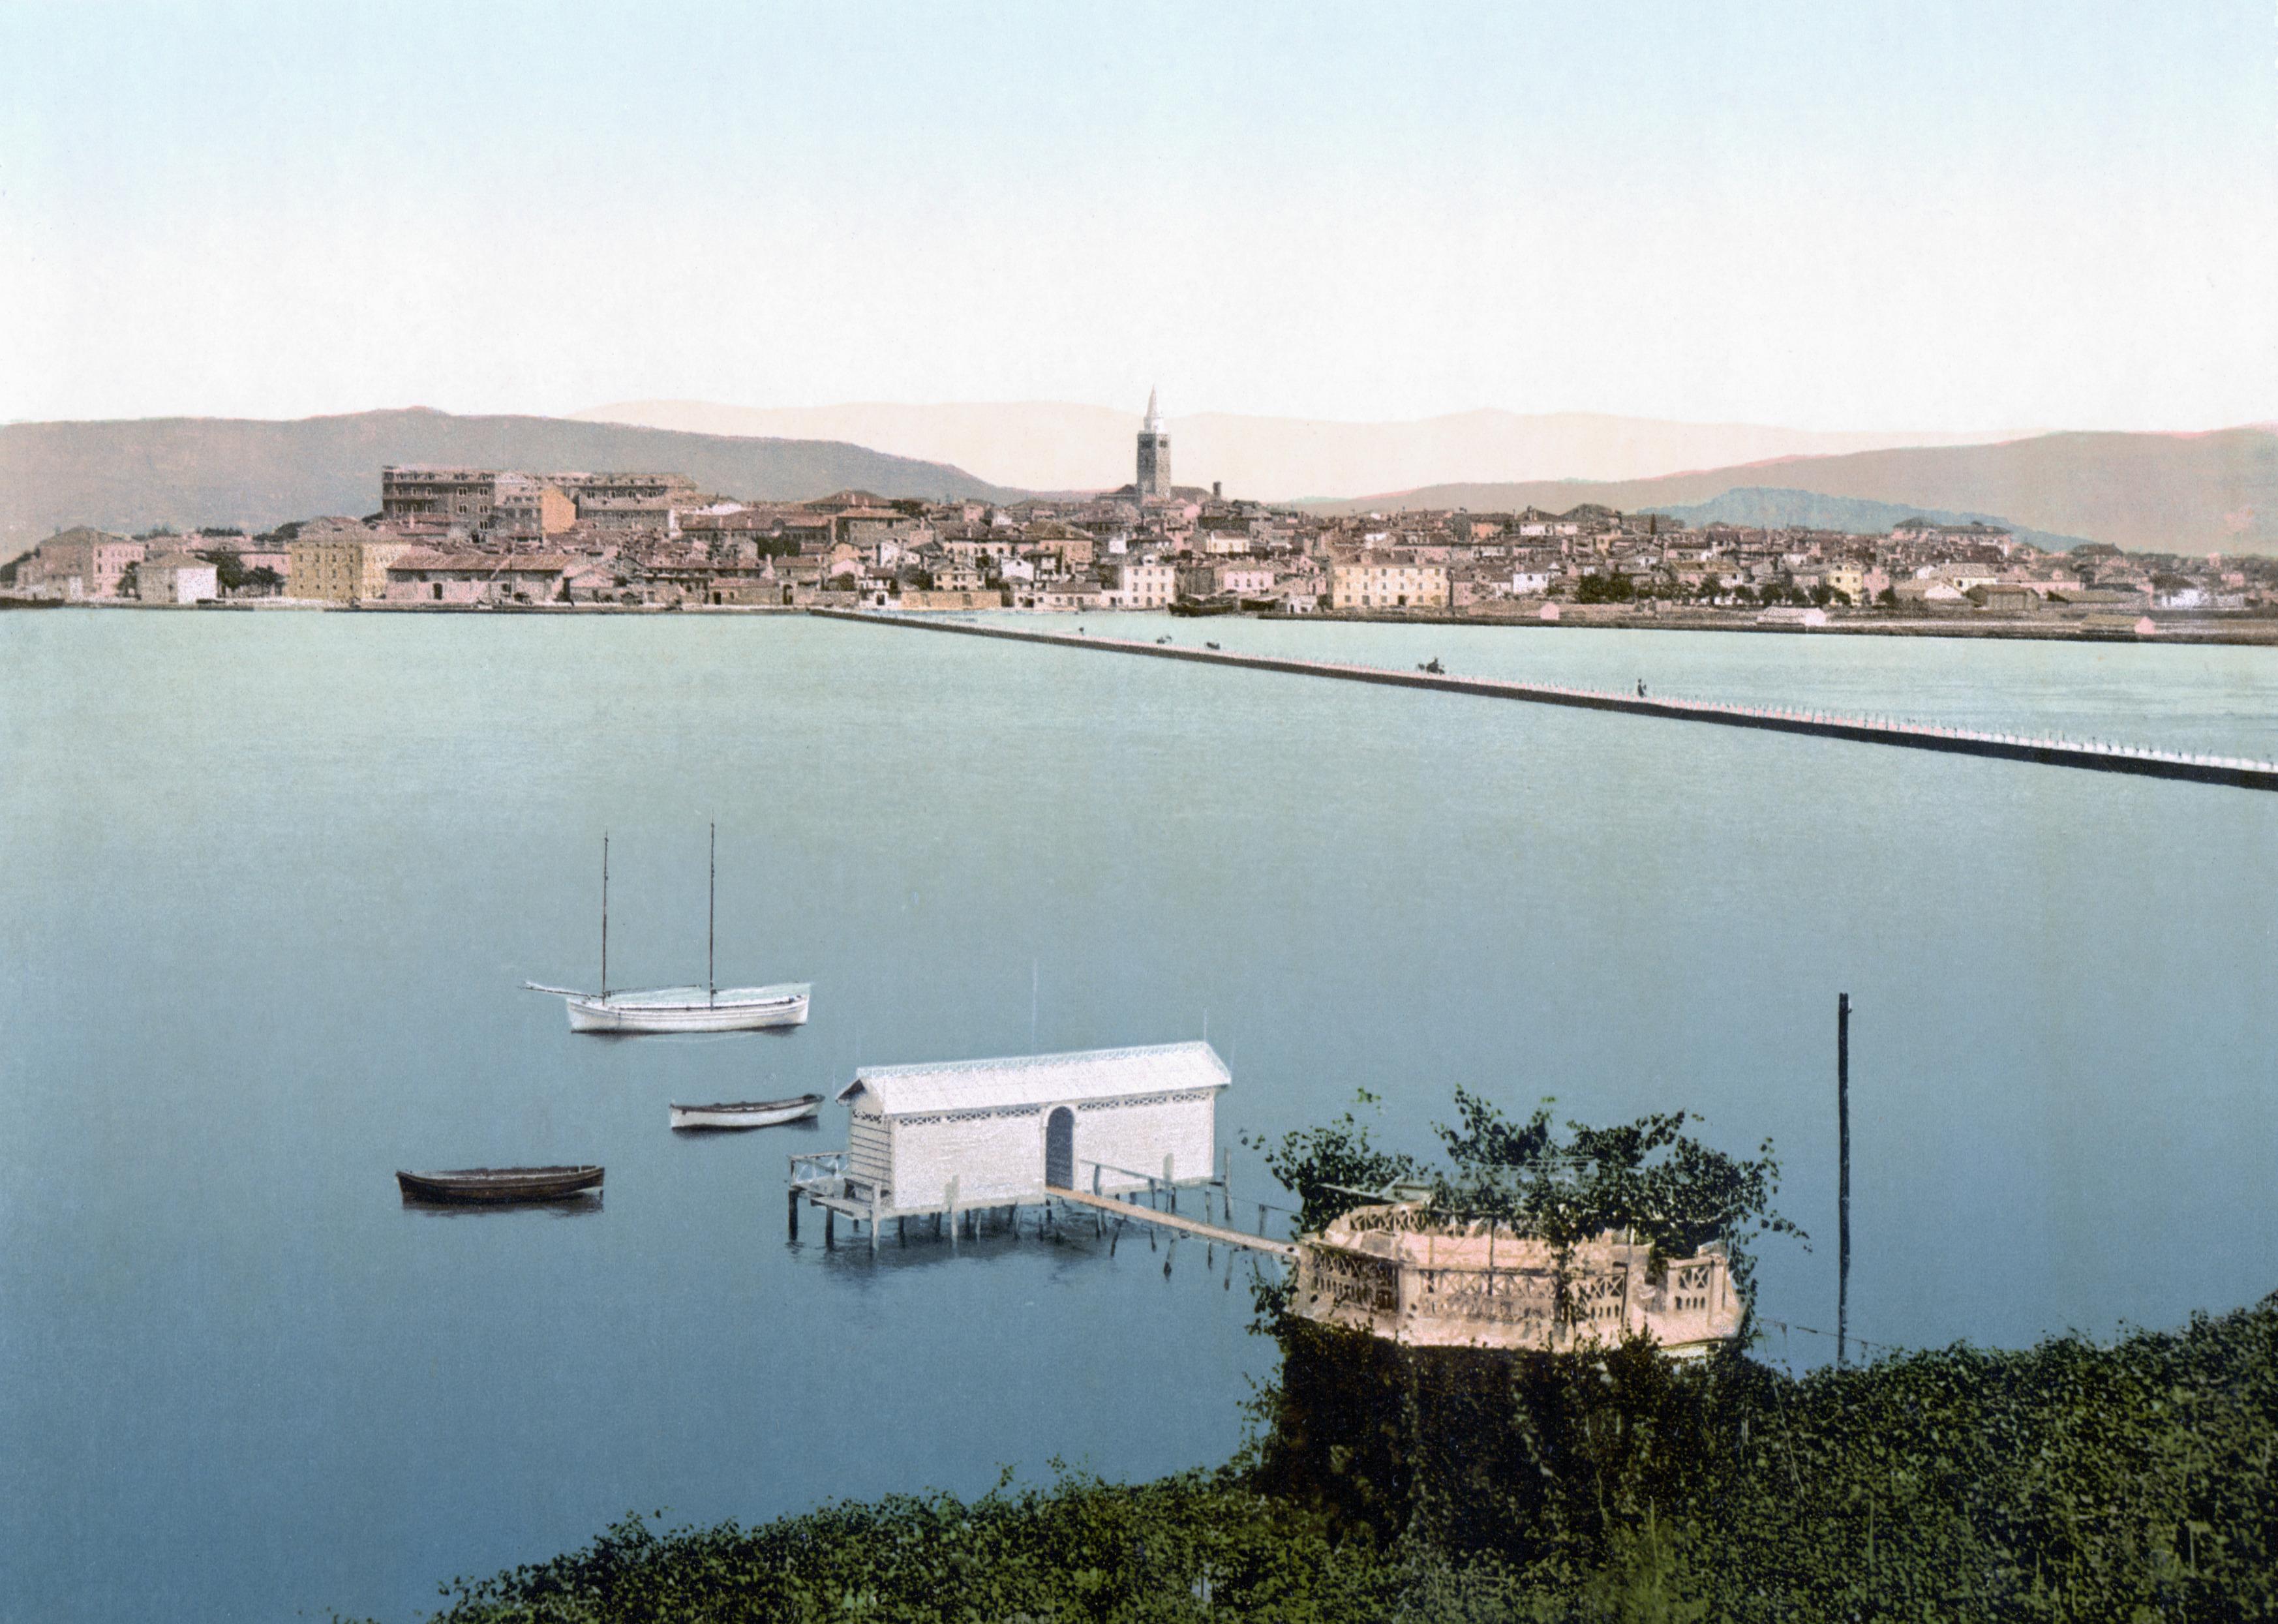 File:Capodistria 1900.jpg - Wikimedia Commons